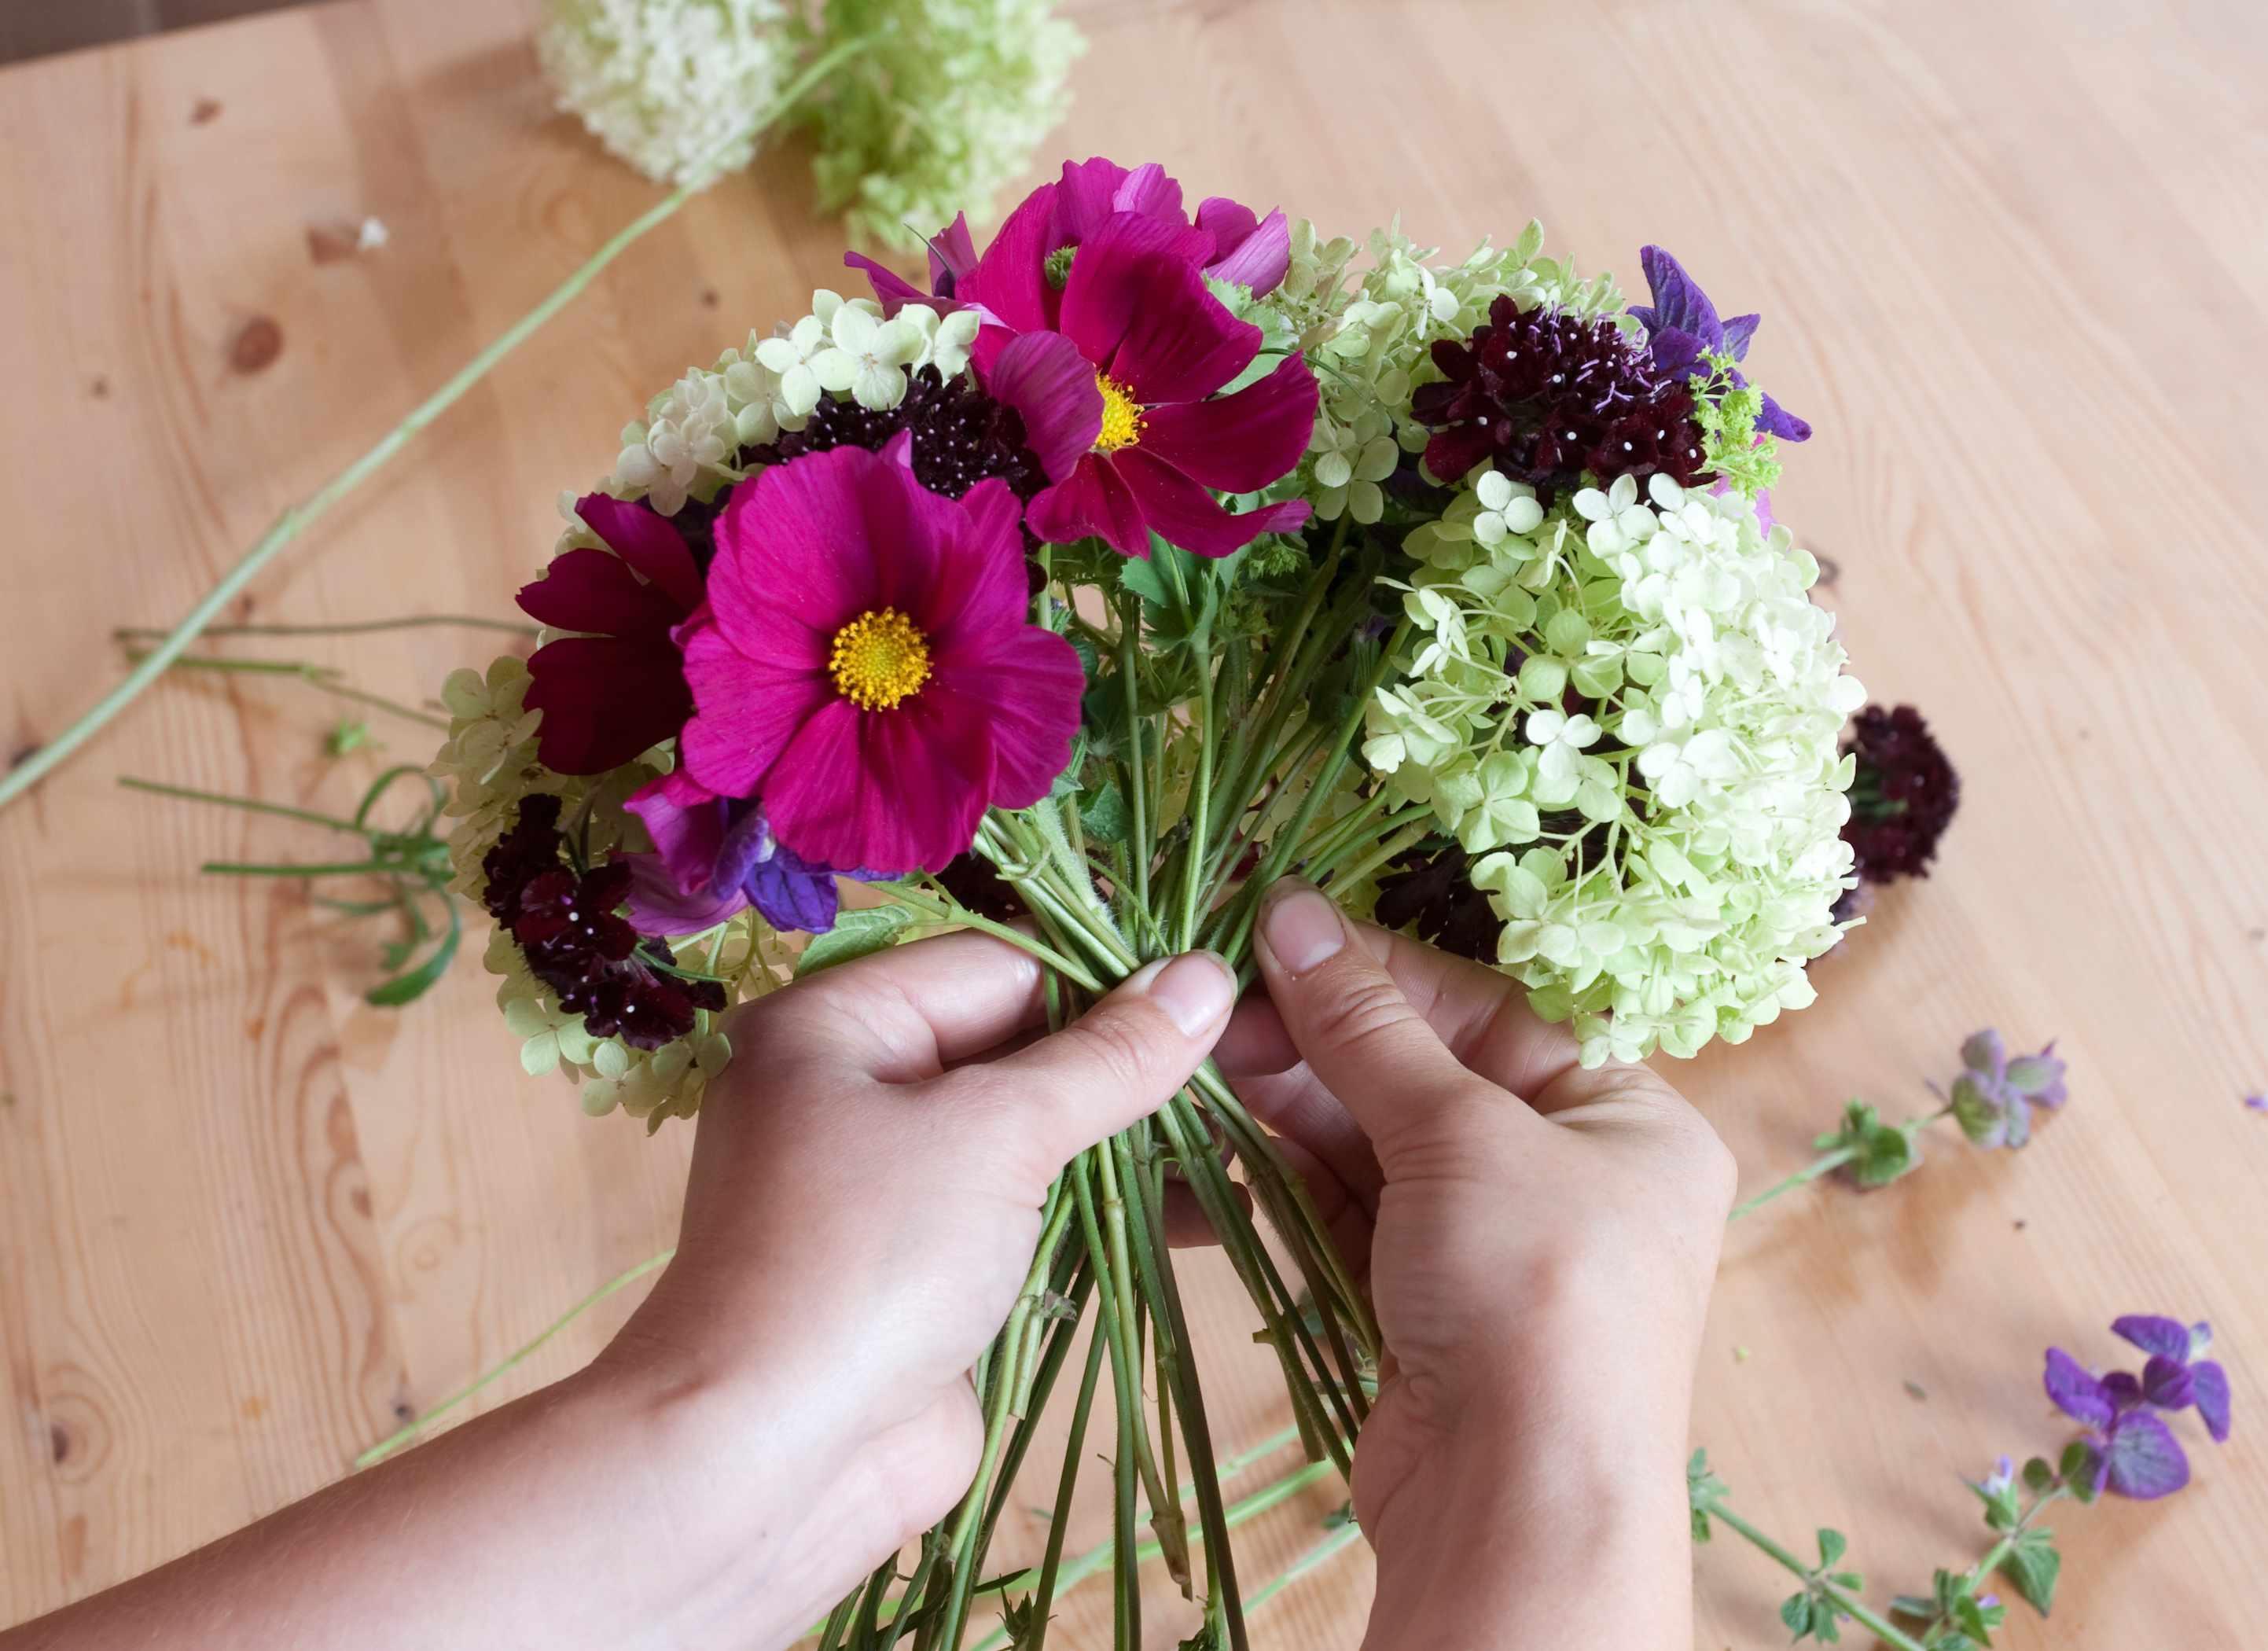 masterclasses-cut-flowers-2048-1365